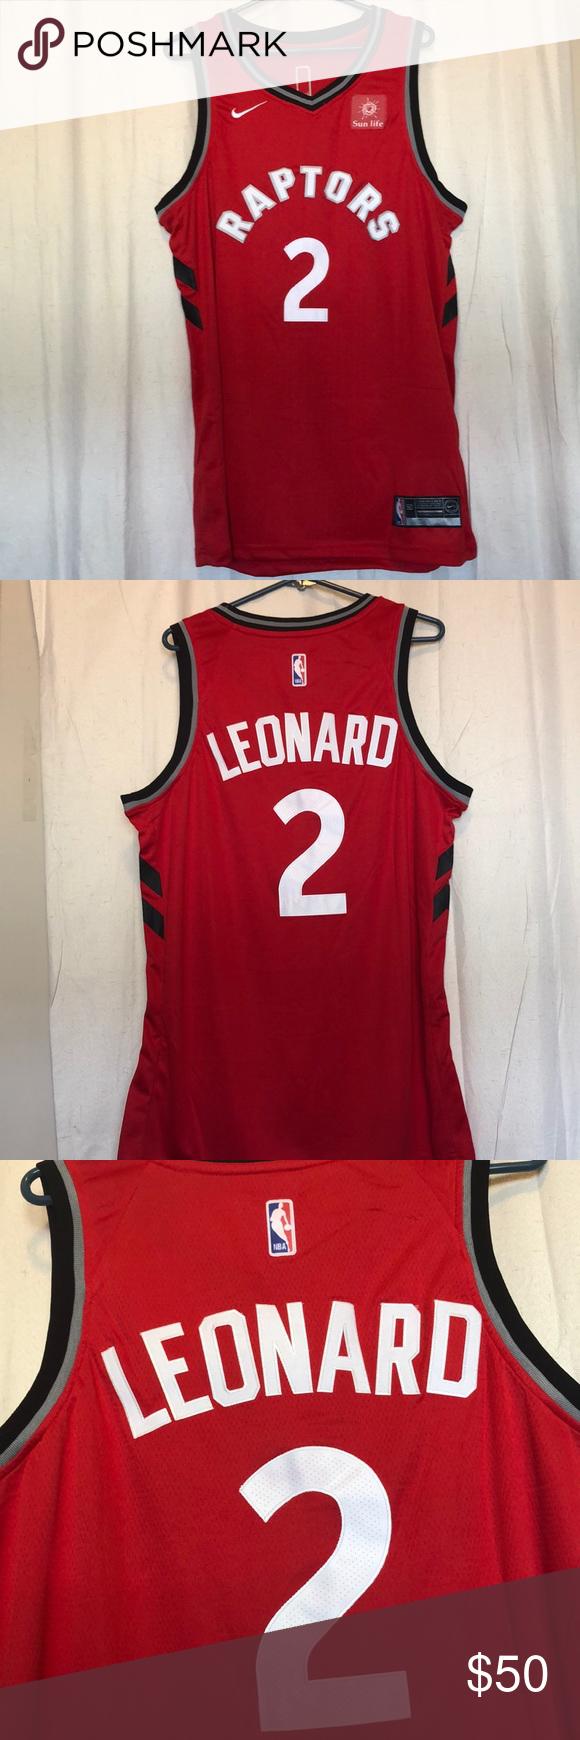 low priced 52a1d c9ba2 NWT Kawhi Leonard Nike Swingman Raptors Jersey🔥 Kawhi ...